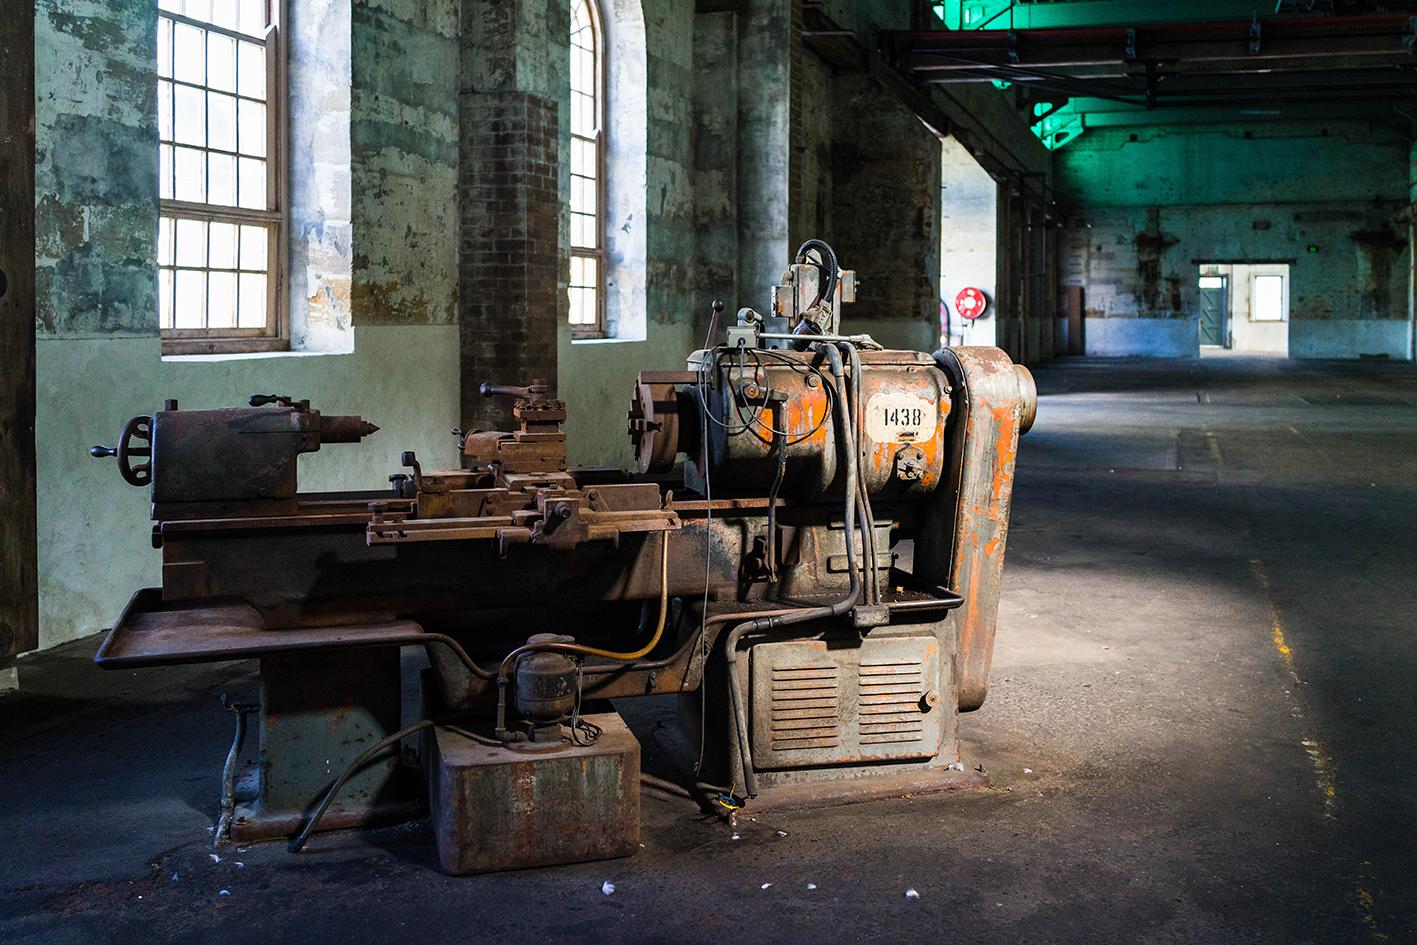 The Automation Apocalypse